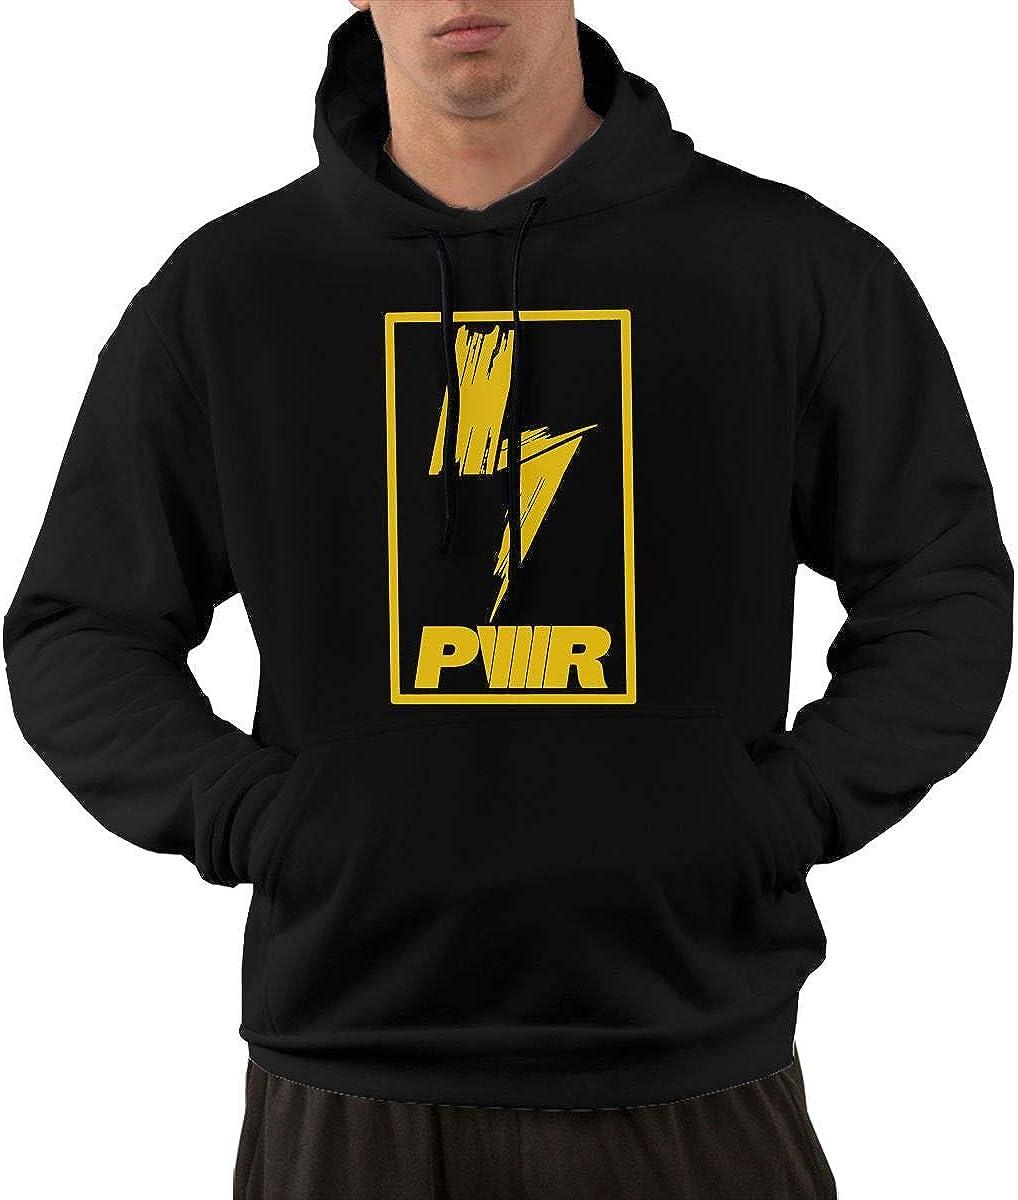 THORP.JENELLE Mens Fashion La-chlan Power Bold Logo Top Sweater Hoodie